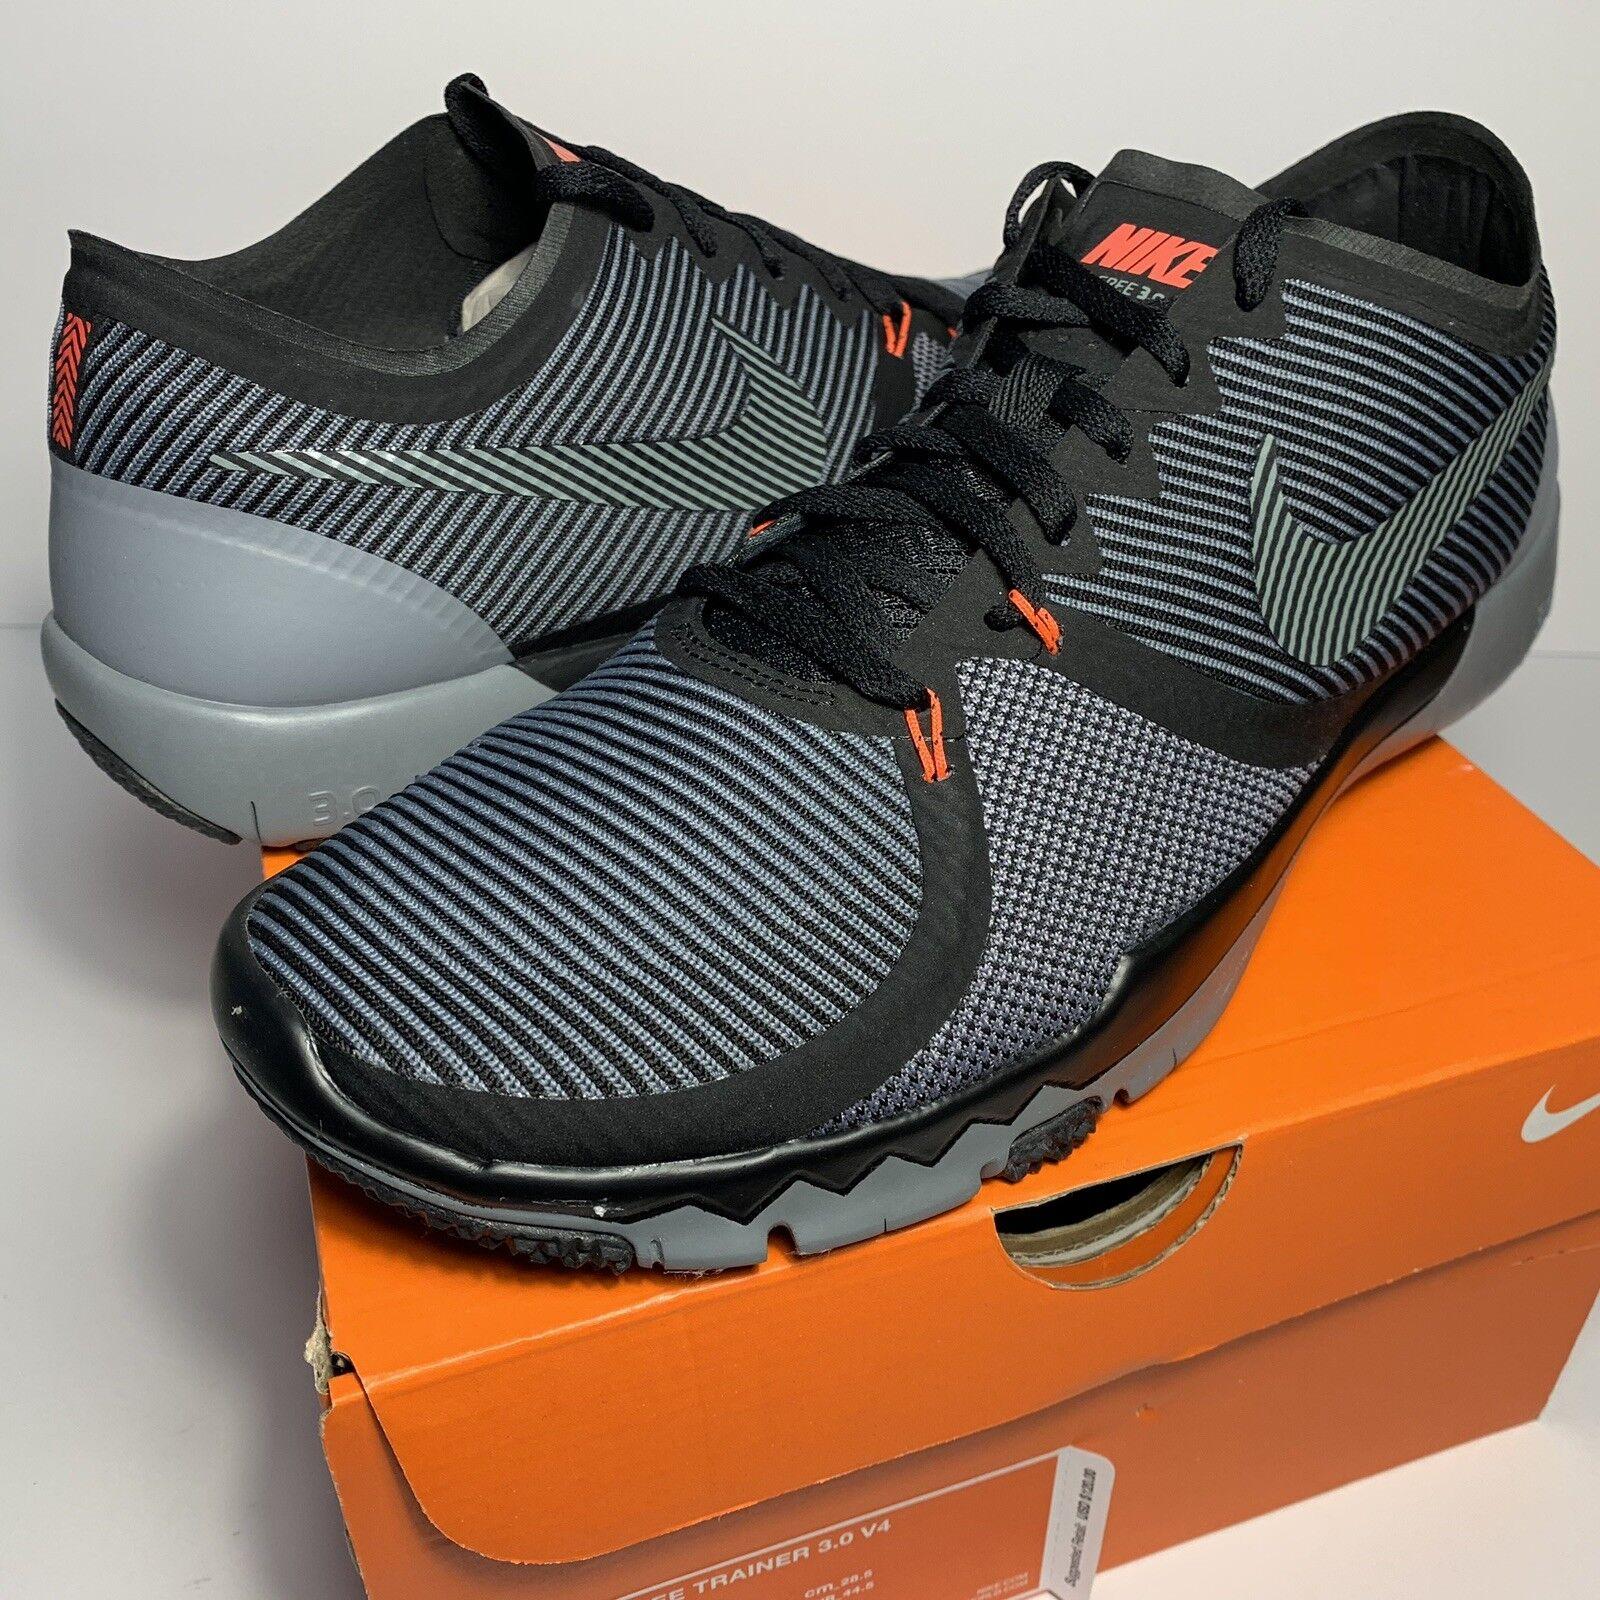 brand new 8e6e1 086be NEW RARE Nike Free Trainer 3.0 V4 749361-001 MEN 10.5 (10 1 2